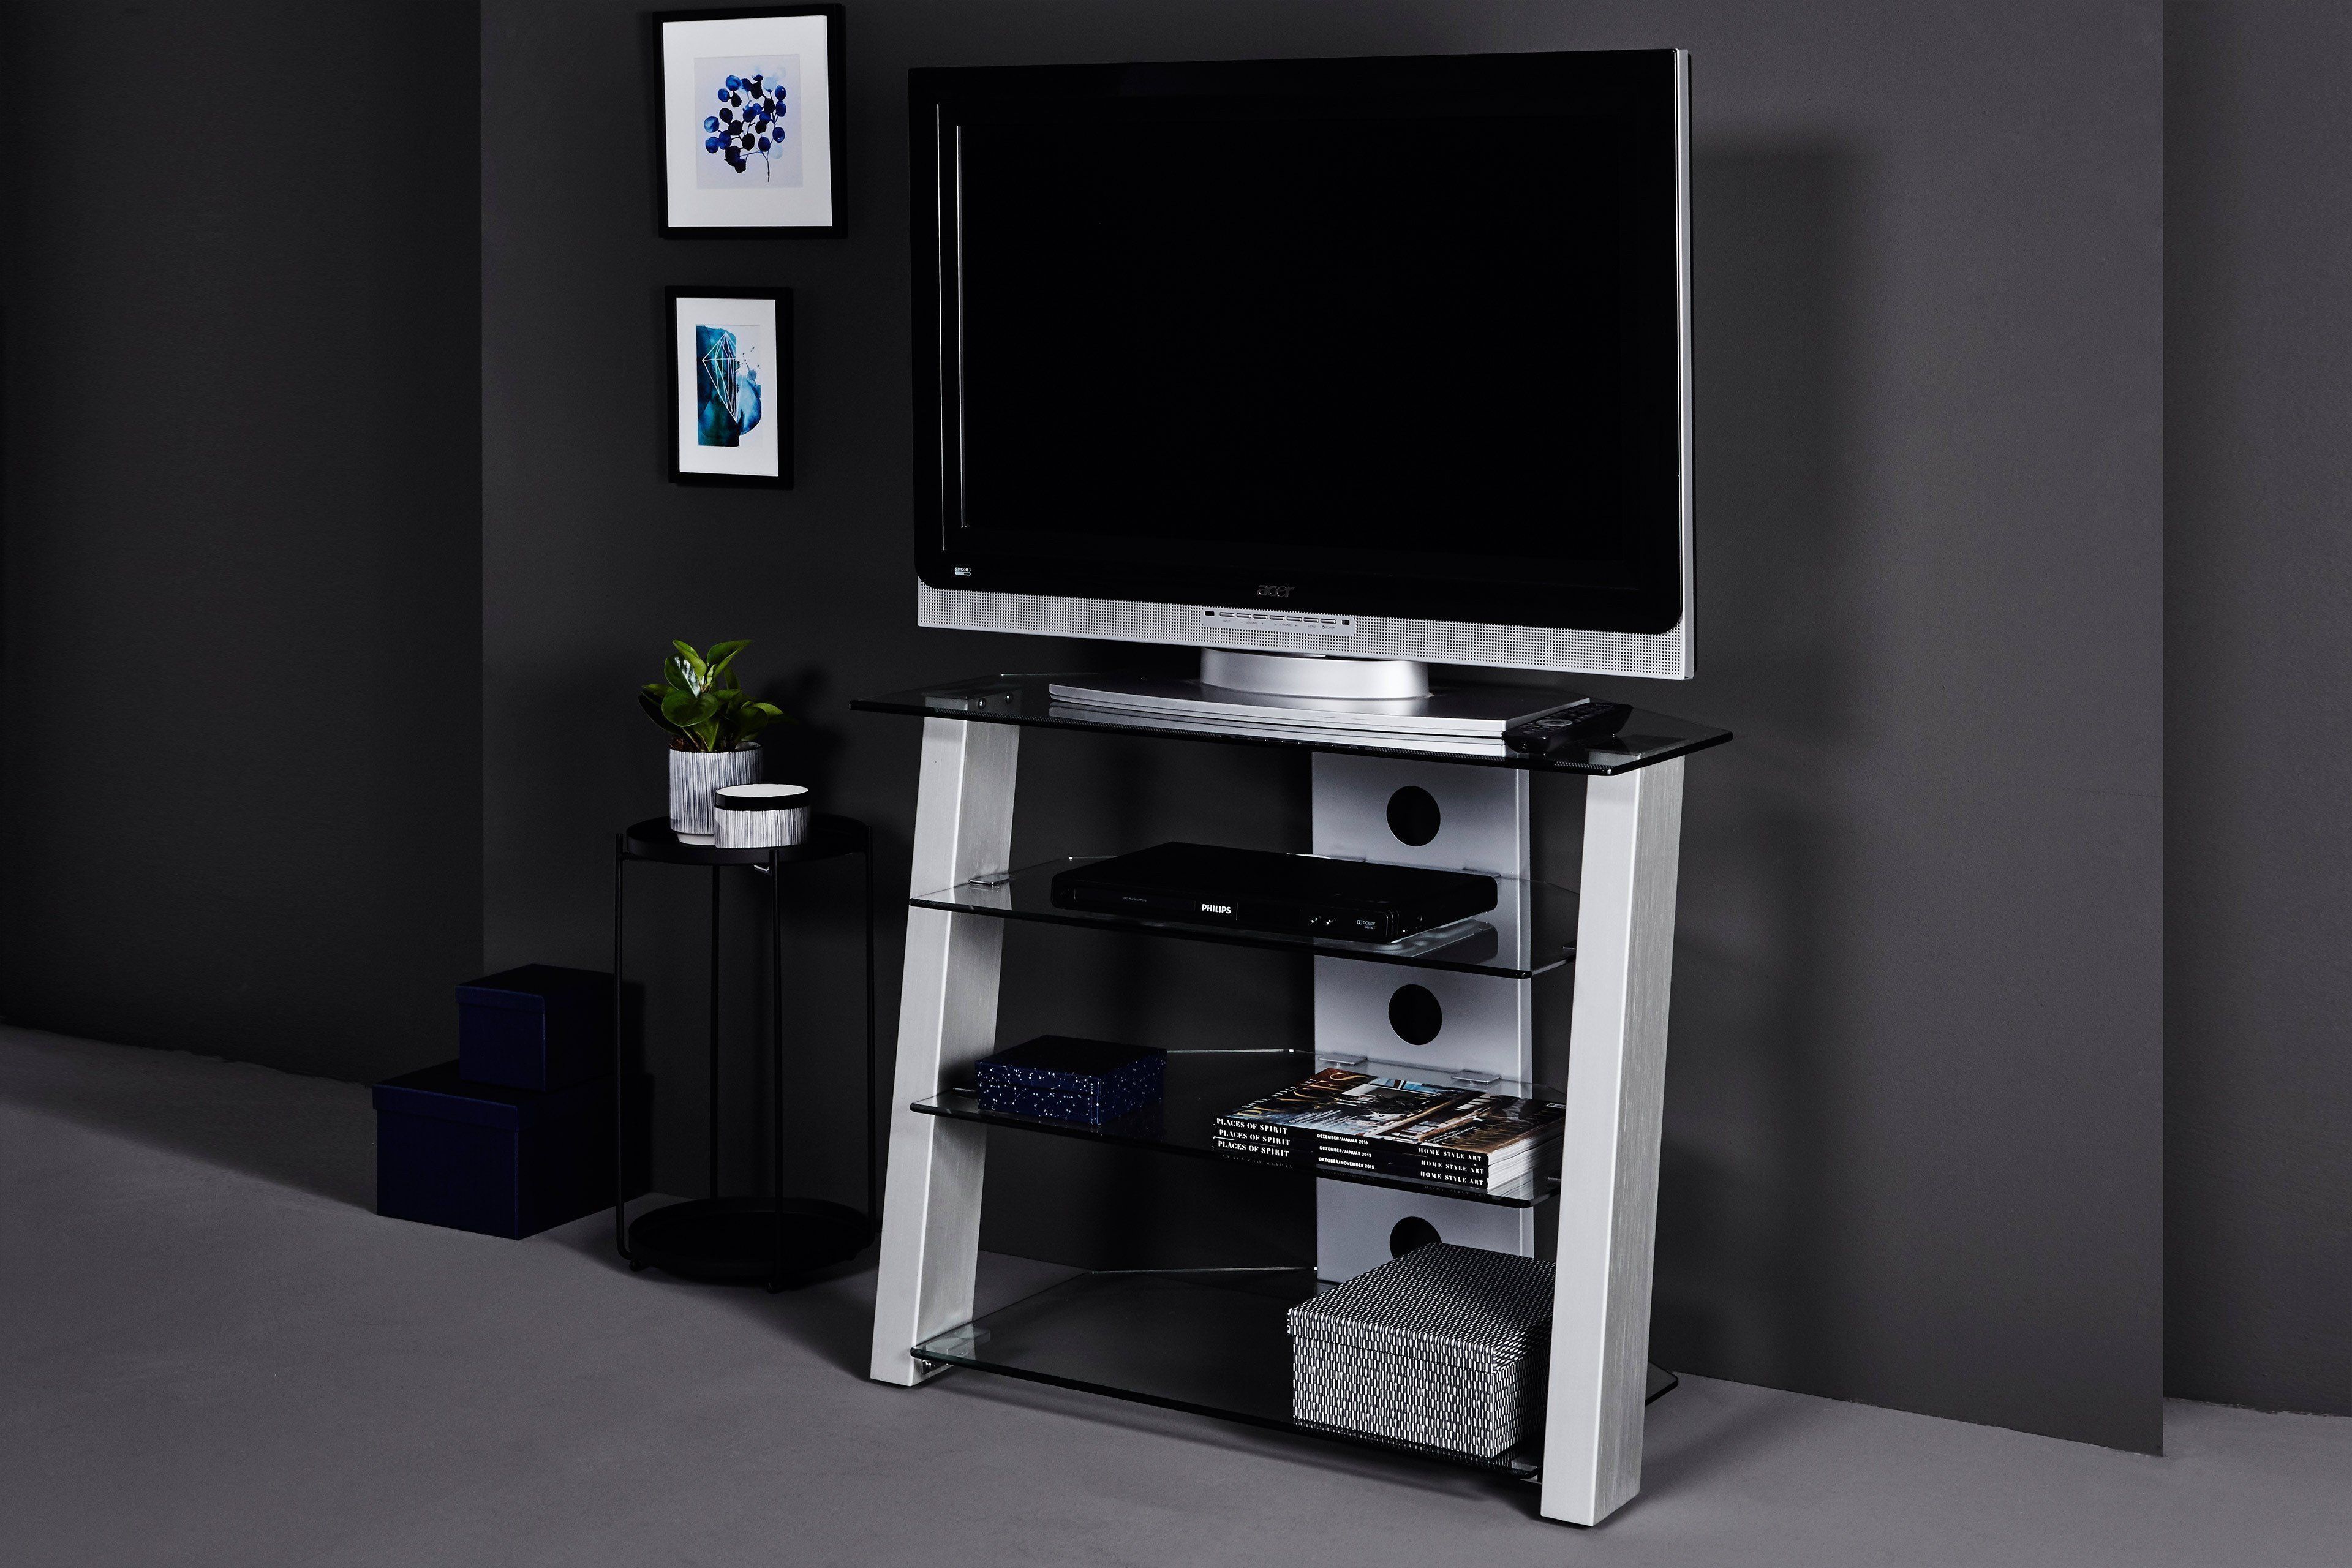 Jahnke Tr 300 Tv Mobel Klarglas Edelstahl Optik Mobel Letz Ihr Online Shop